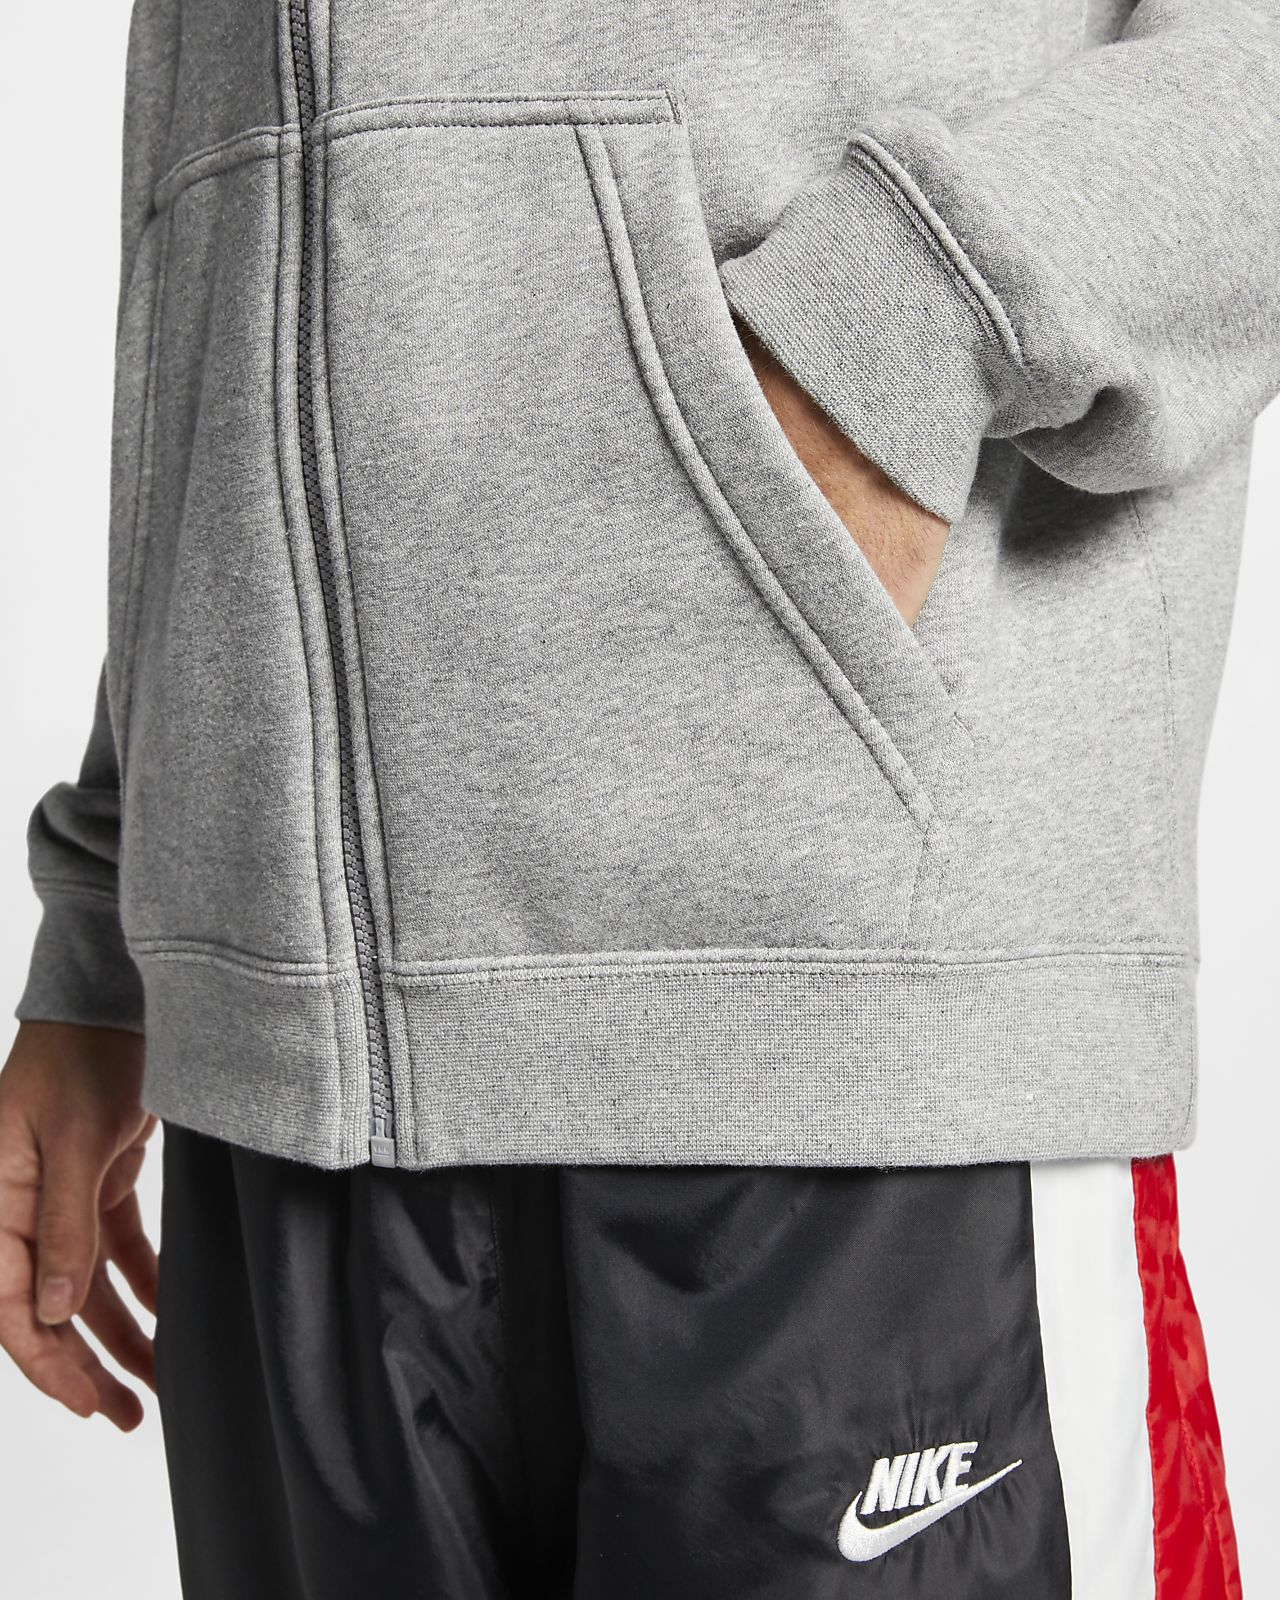 76d35afb61f6 Nike Sportswear Club Fleece Men s Hoodie. Nike.com GB